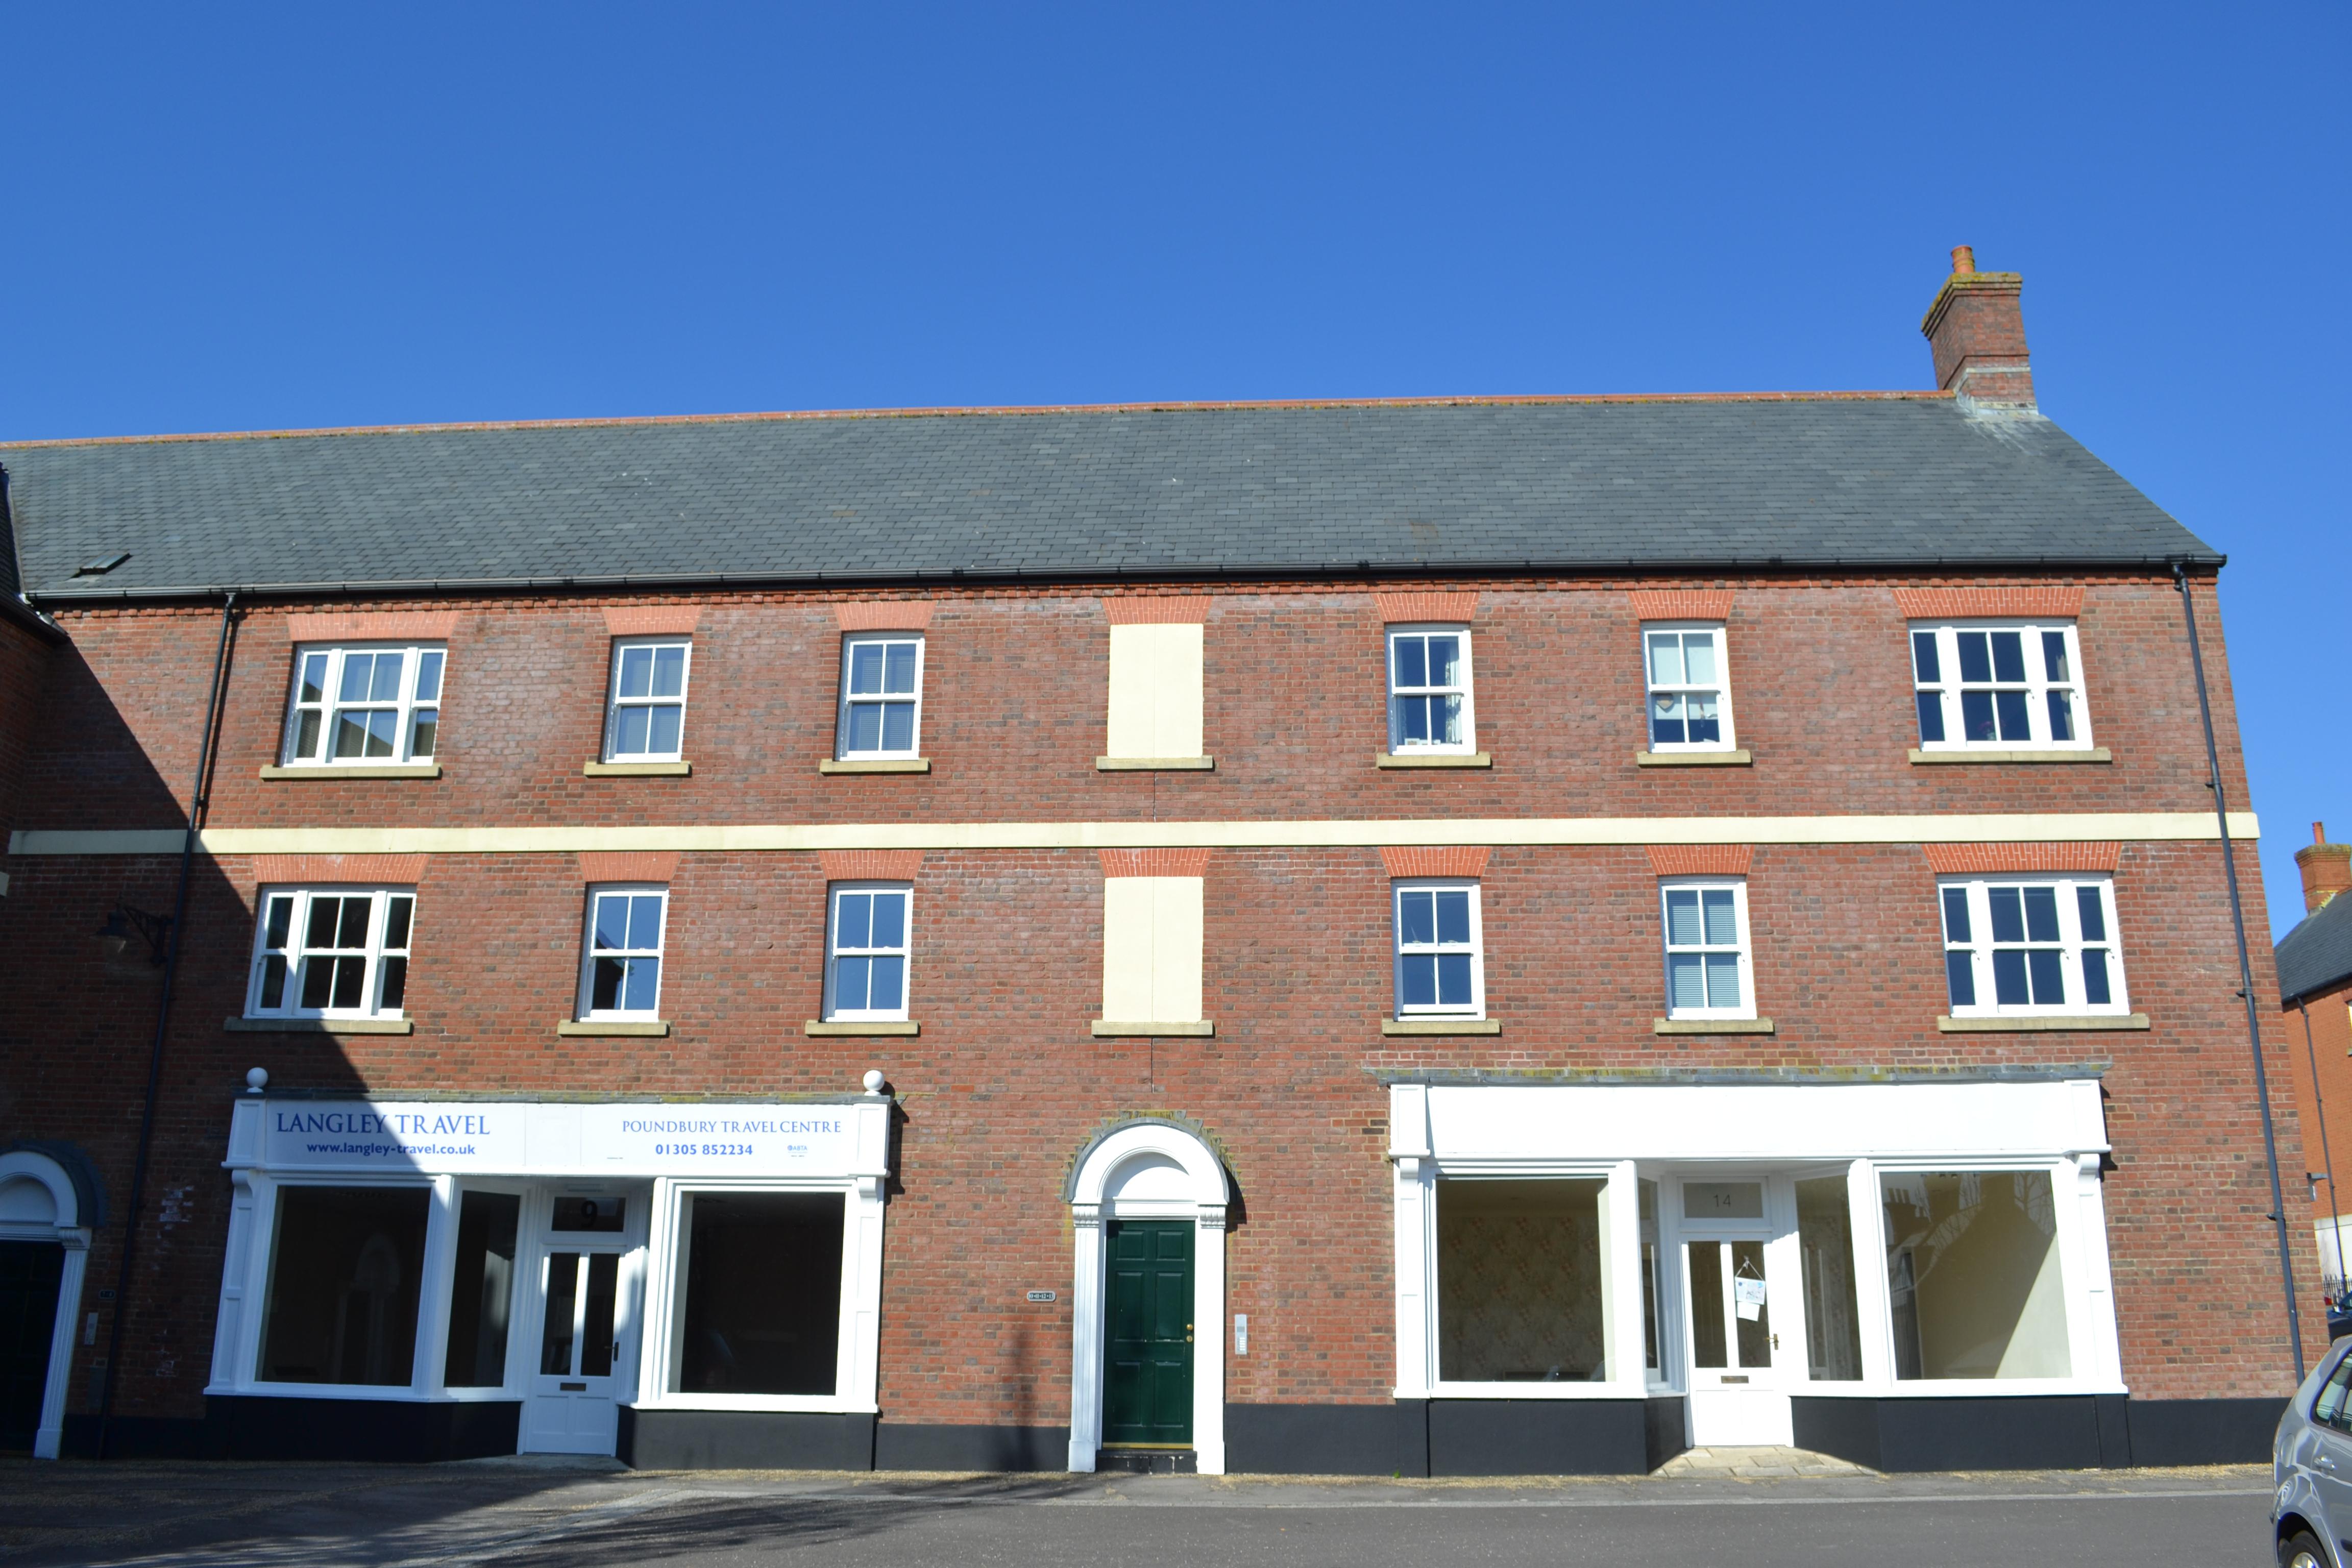 Challacombe Square